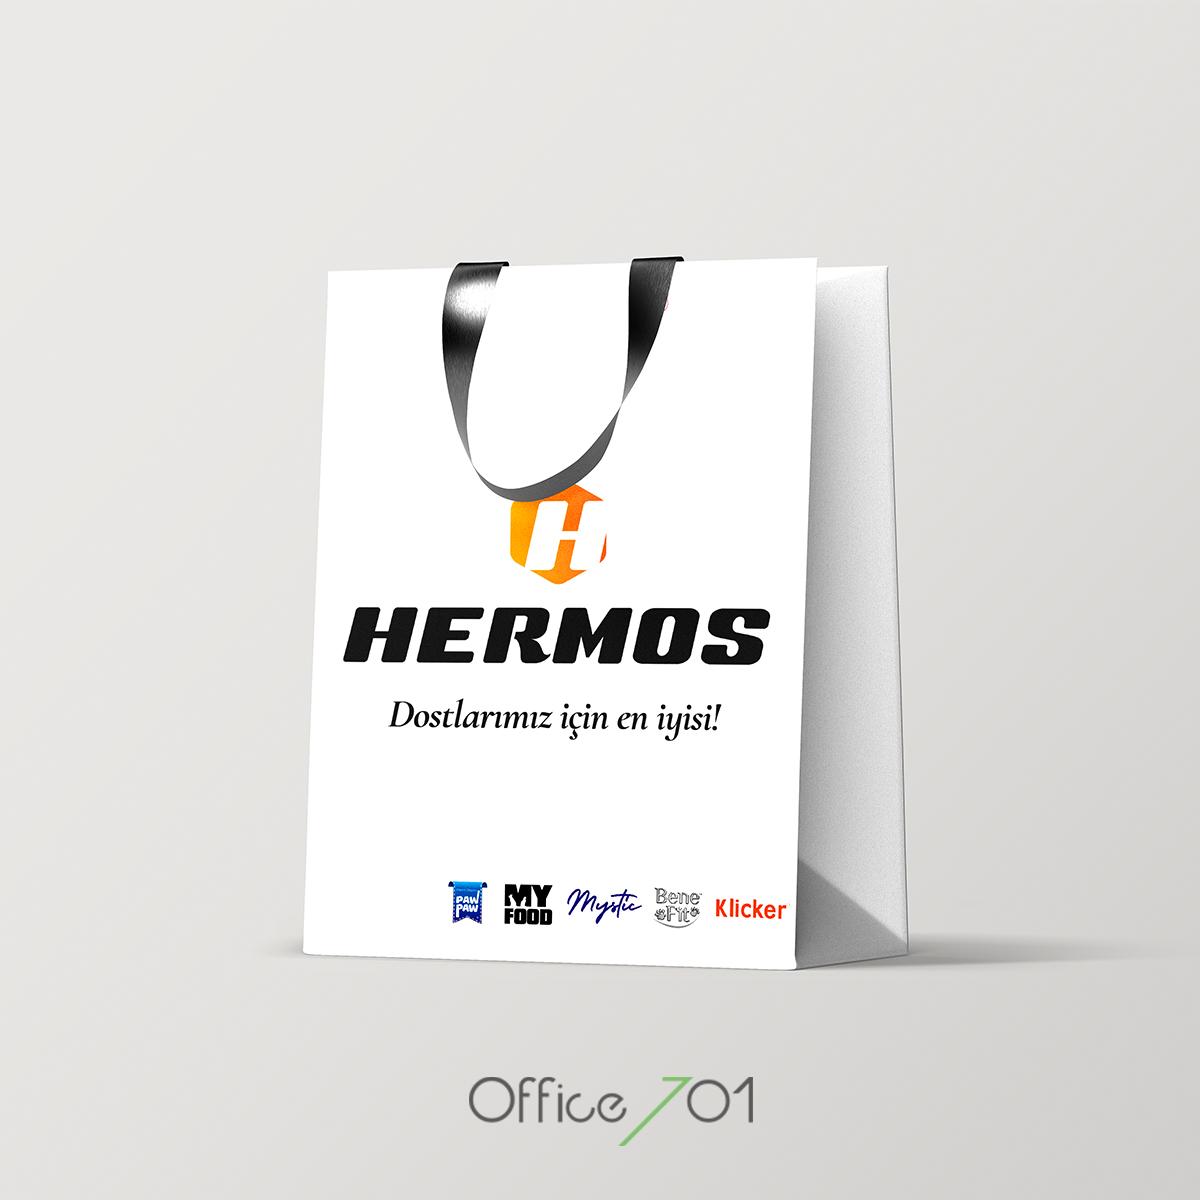 Office701 | Hermos | Bag Design